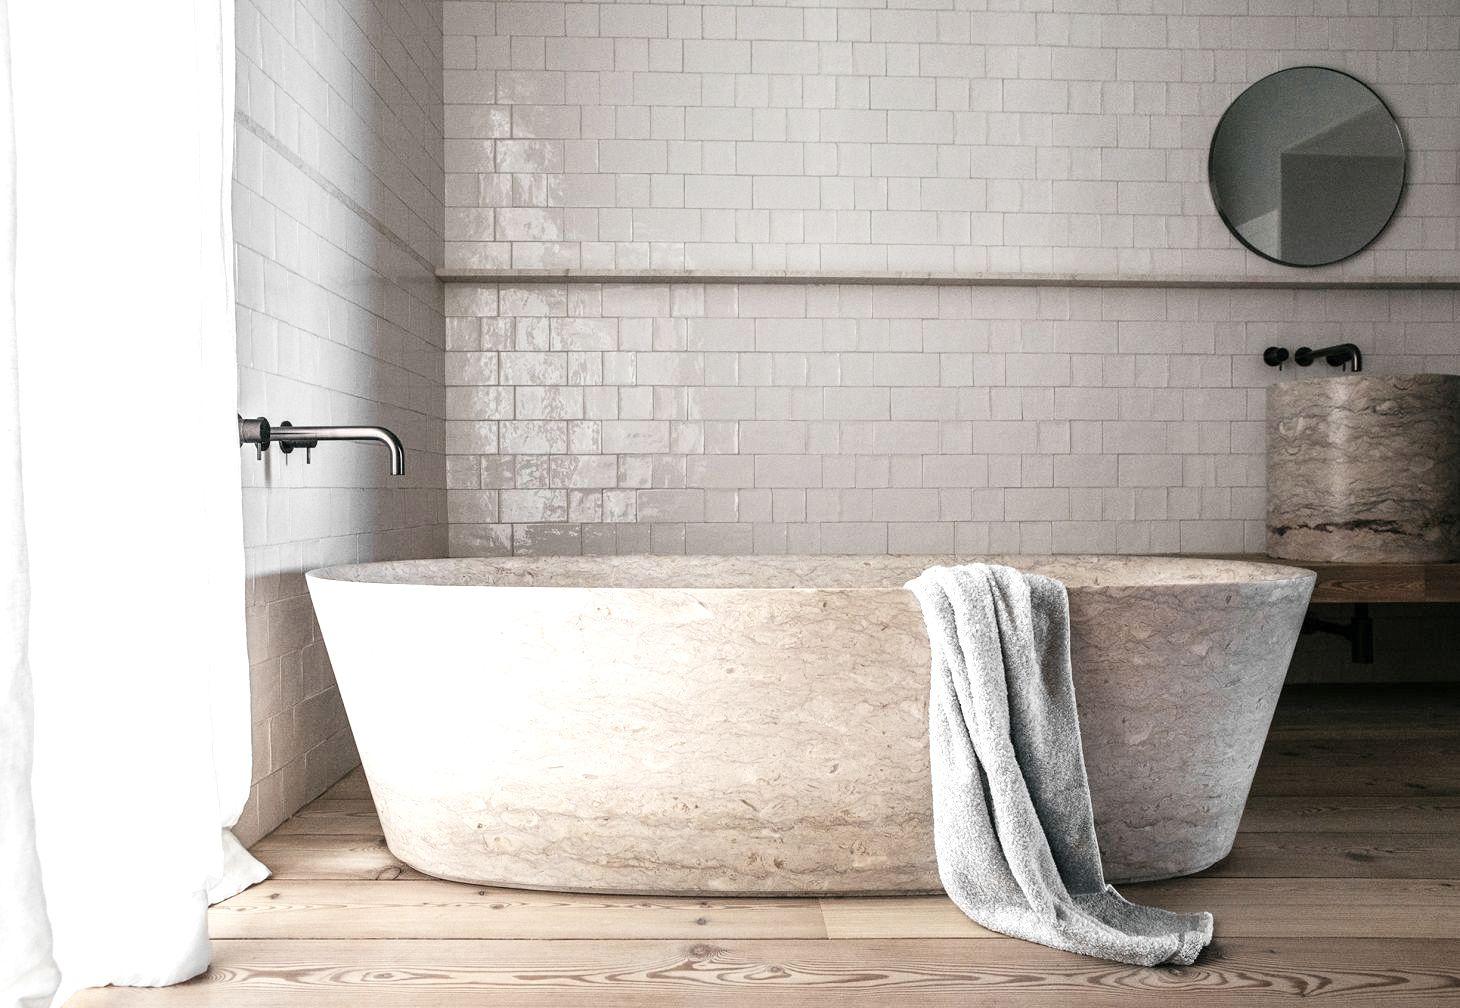 Santa Clara 1728 : Santa clara lotta agaton interiors bath